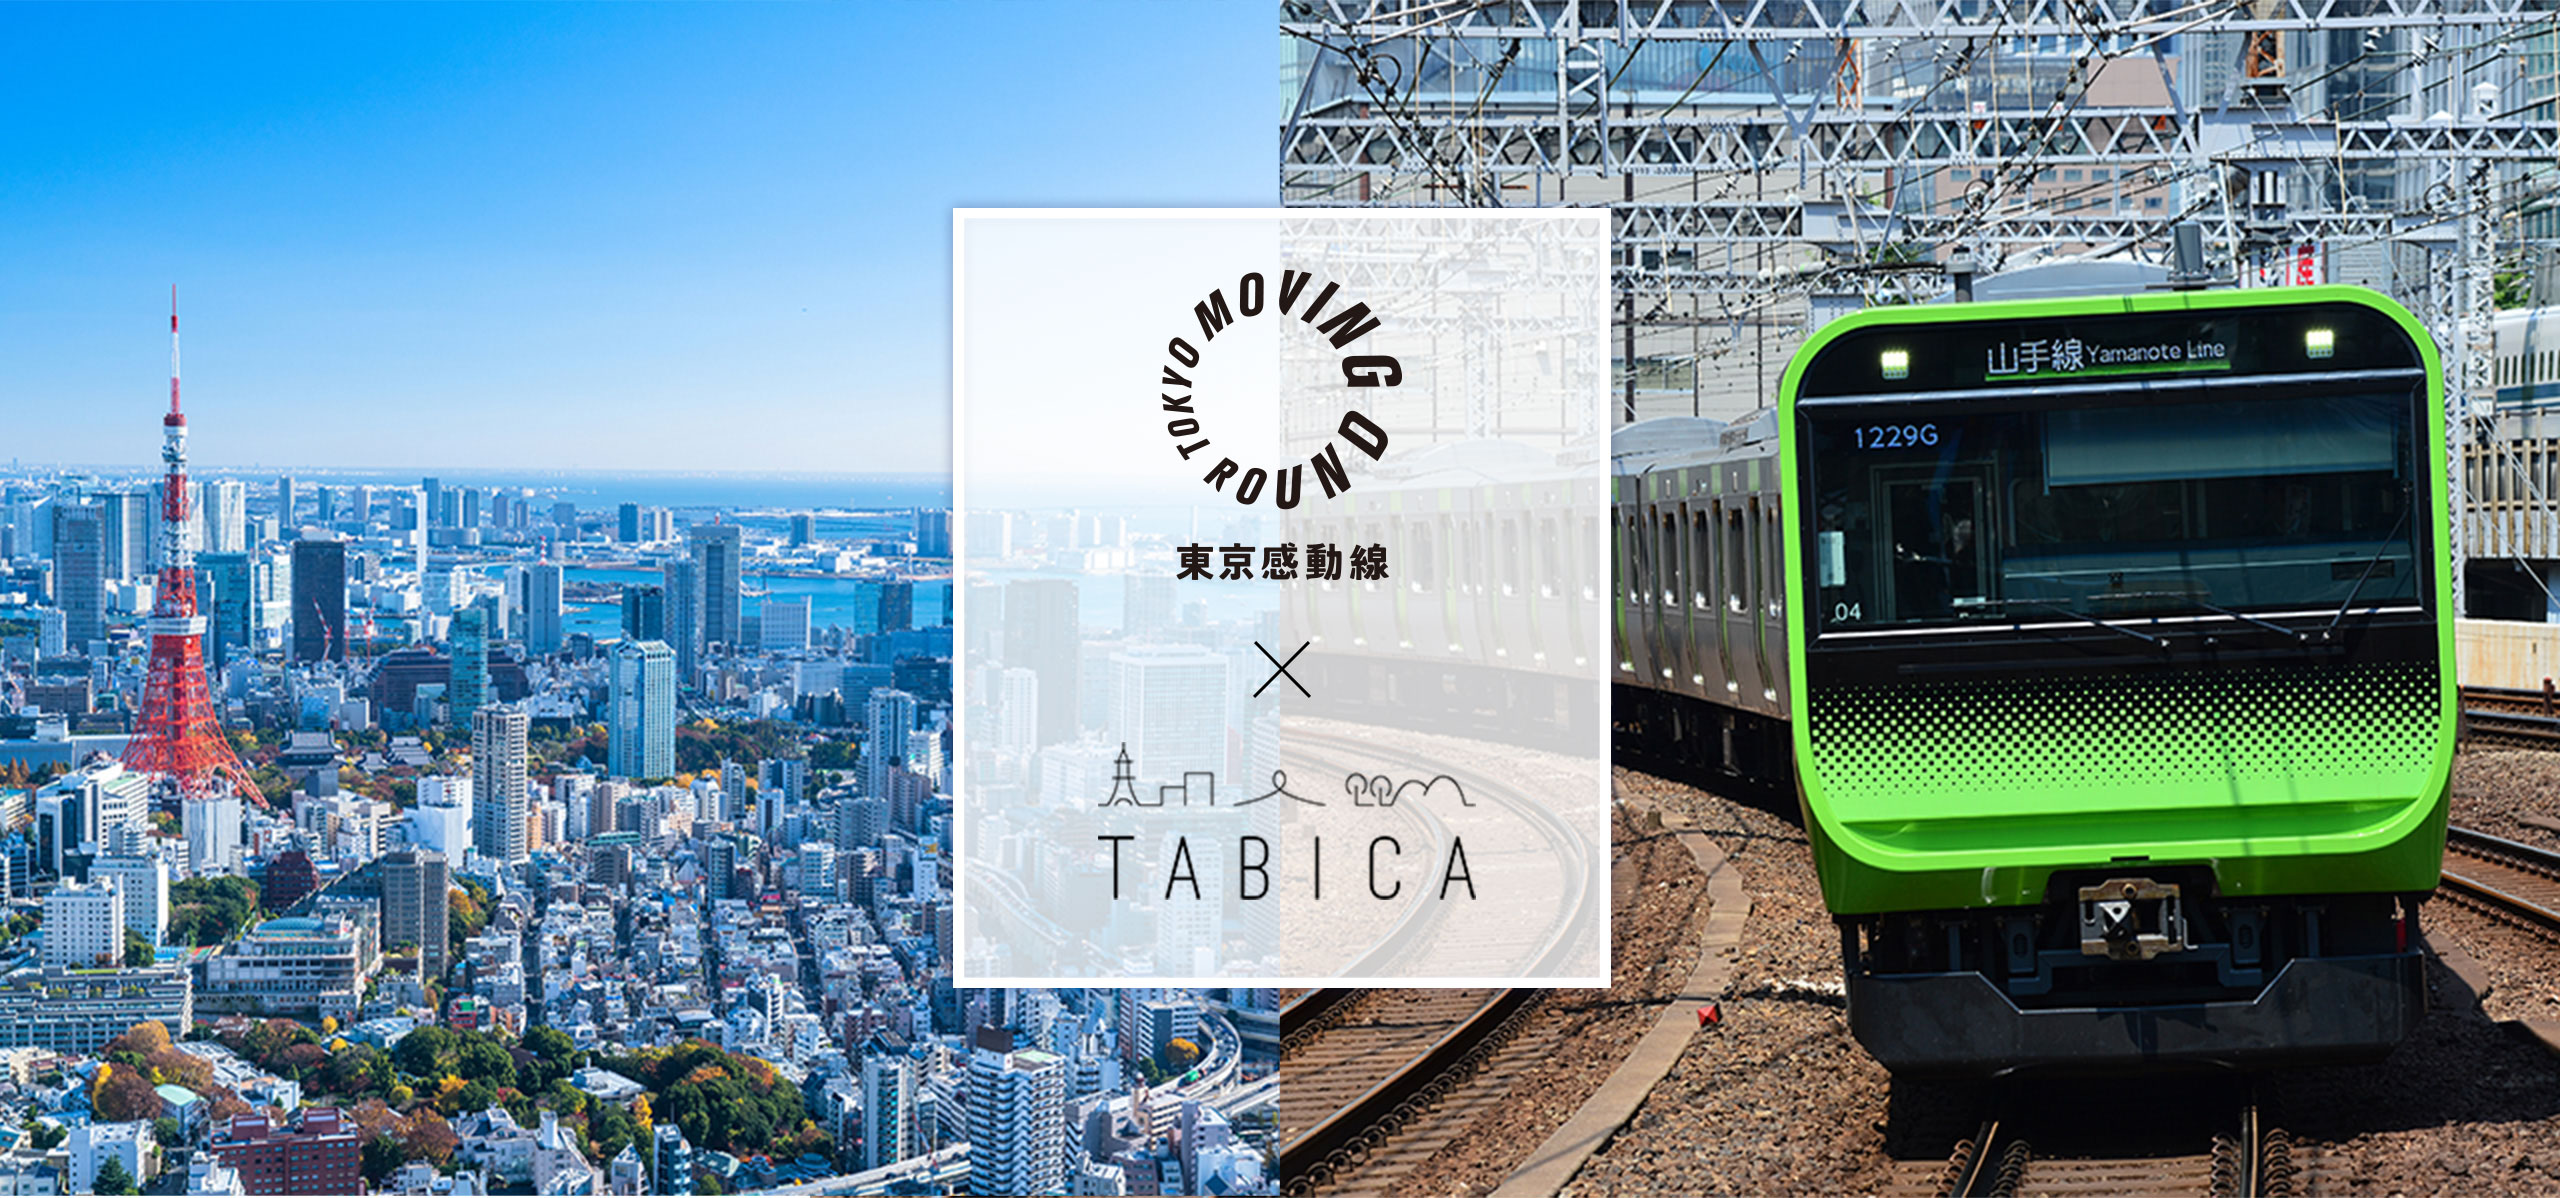 東京感動線/TOKYO MOVING ROUND×TABICA